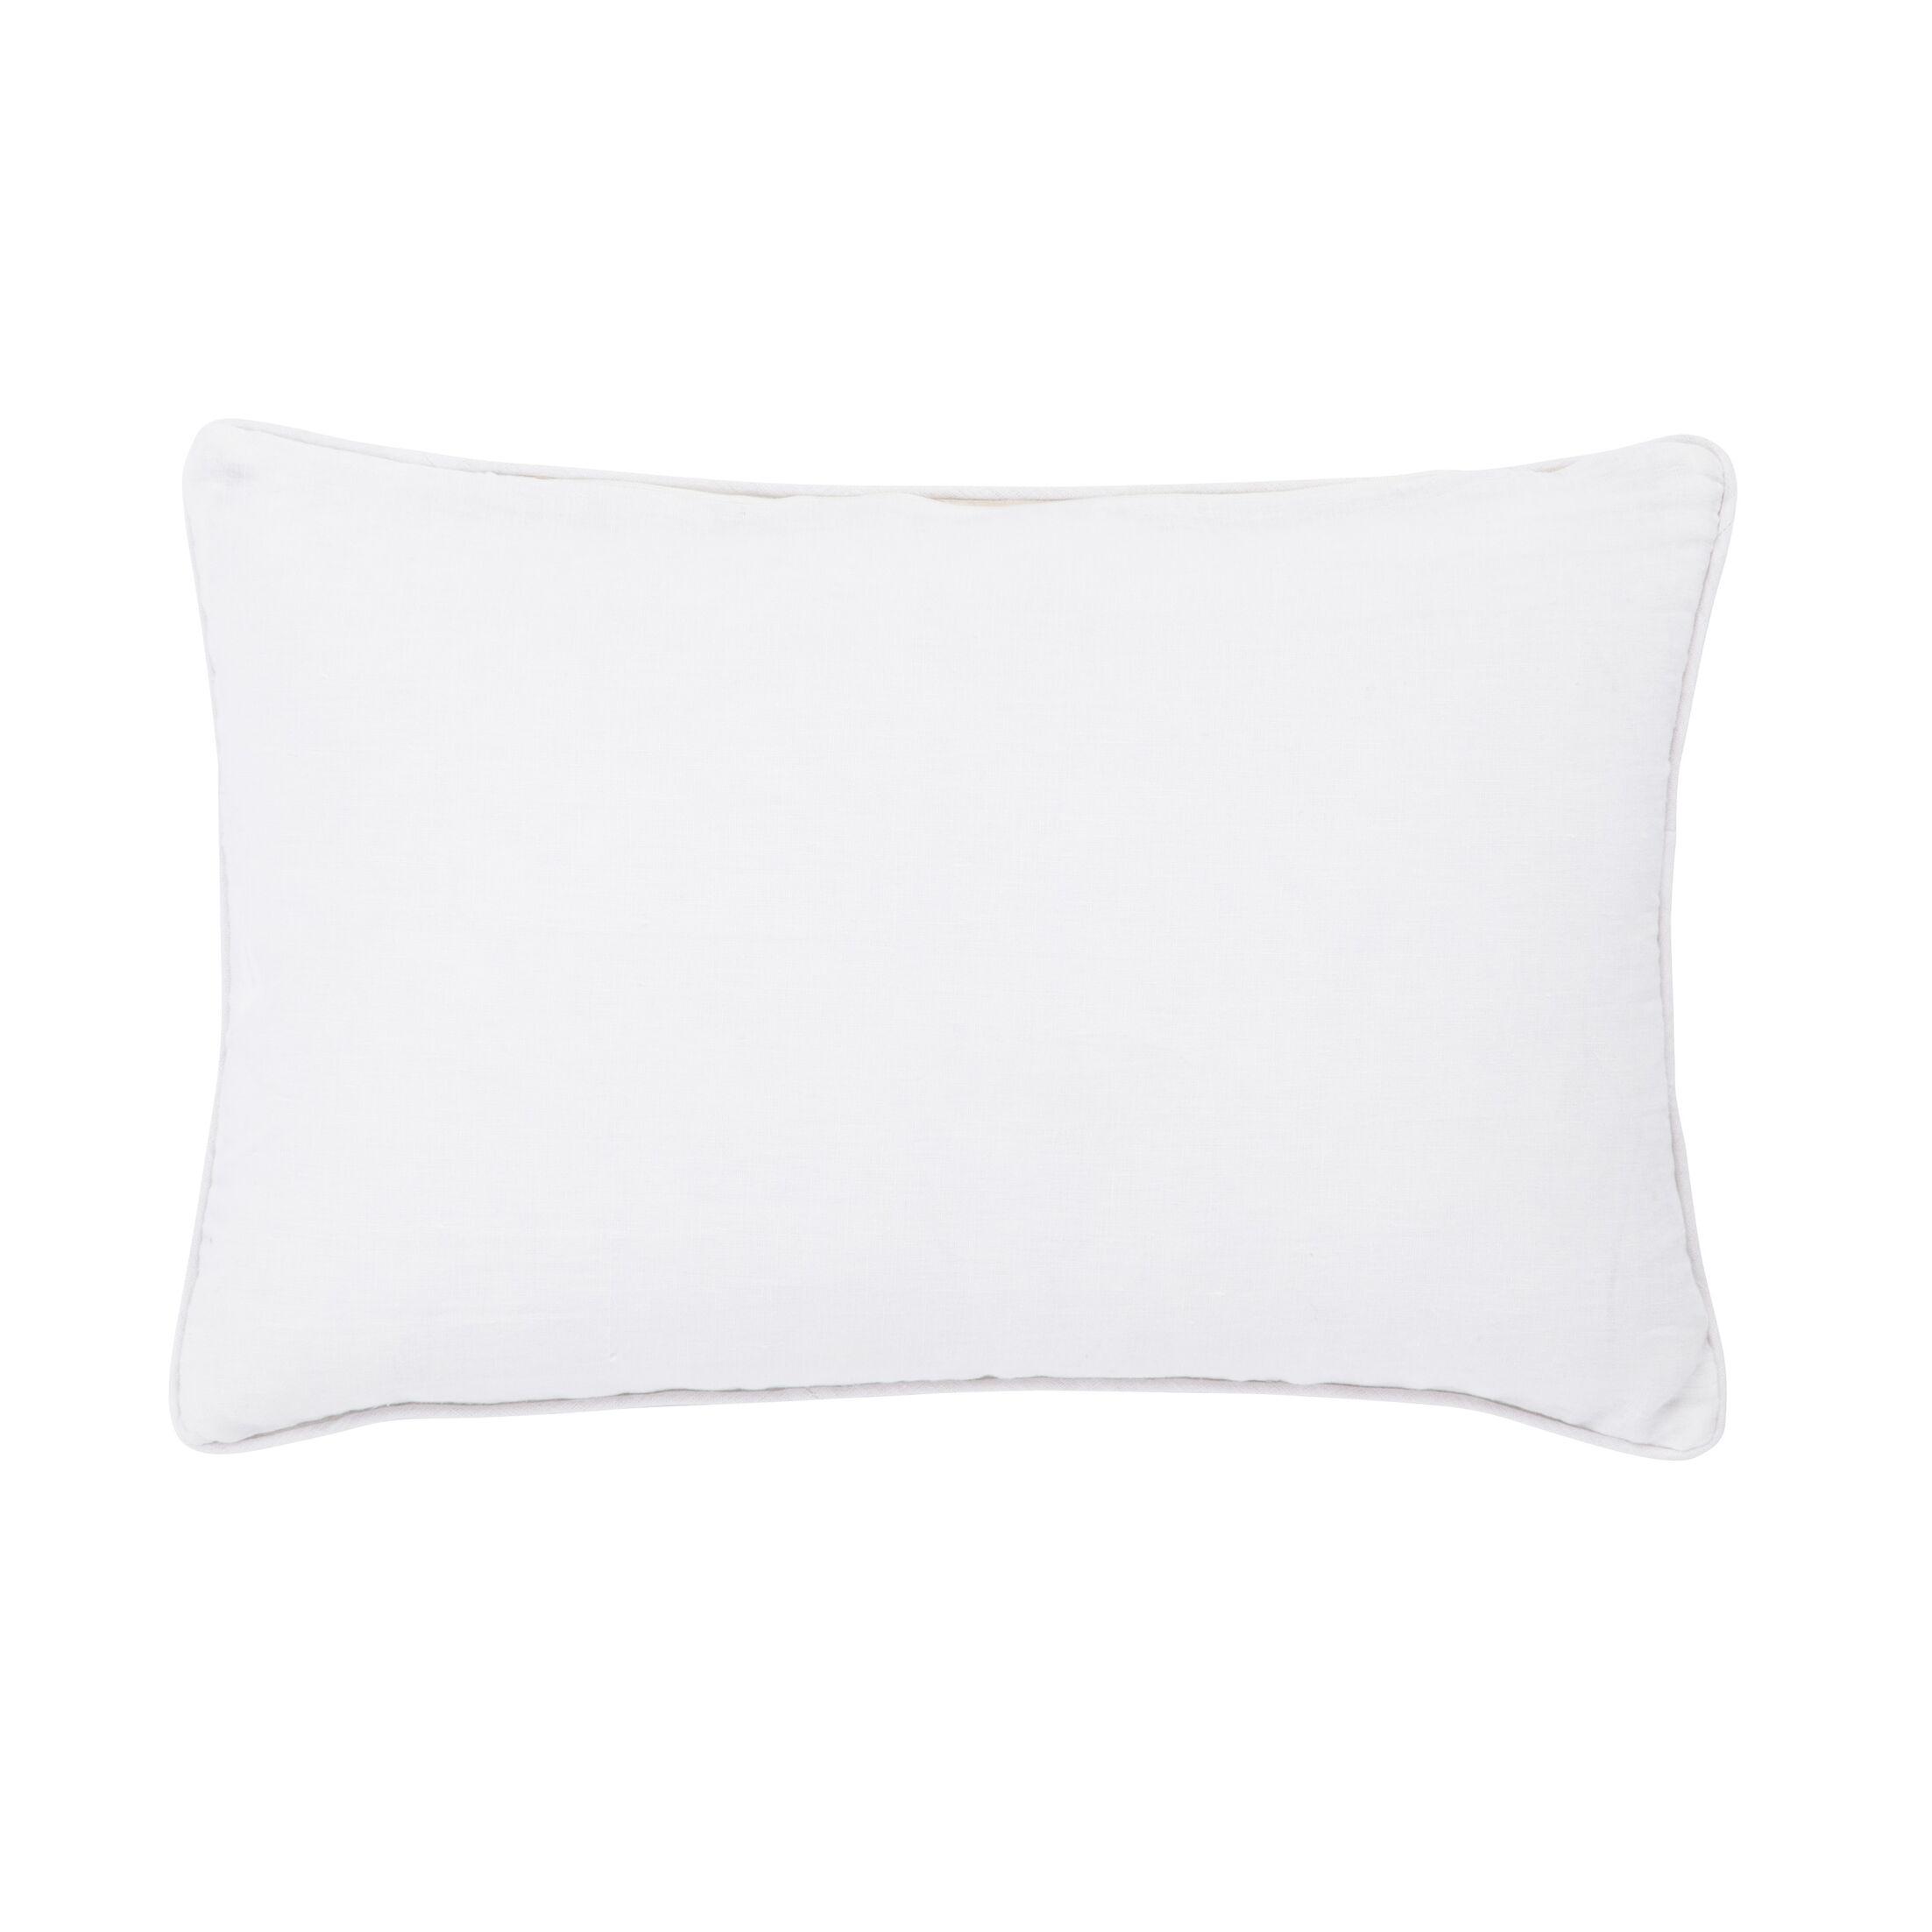 Living Priscilla Geometric Linen Lumbar Pillow Color: Blue/Ivory, Fill: Polyester / Polyfill